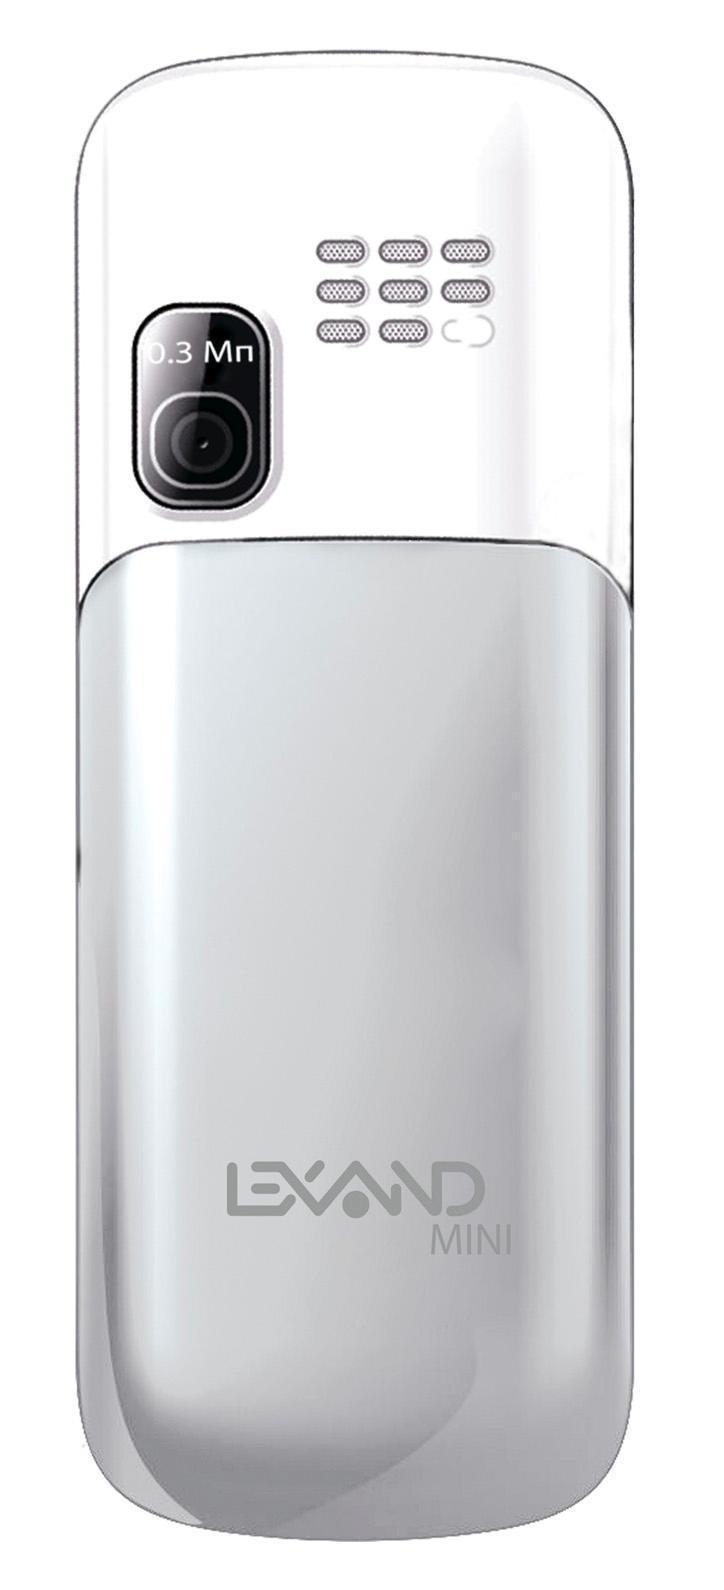 Lexand LPH3 Mini, White